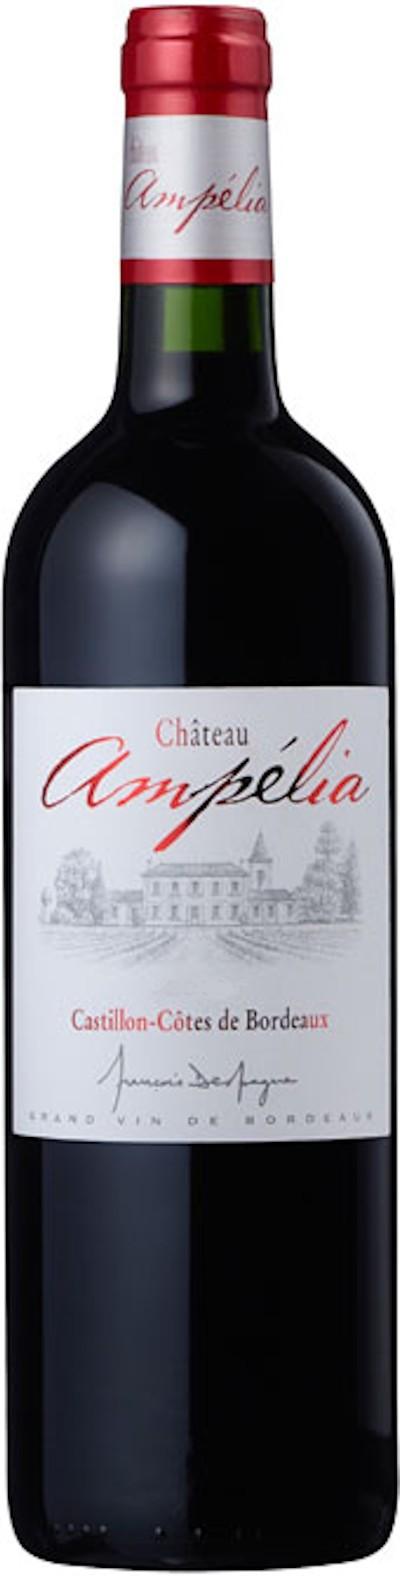 Chateau Ampelia - Cotes de Castillon, 2003